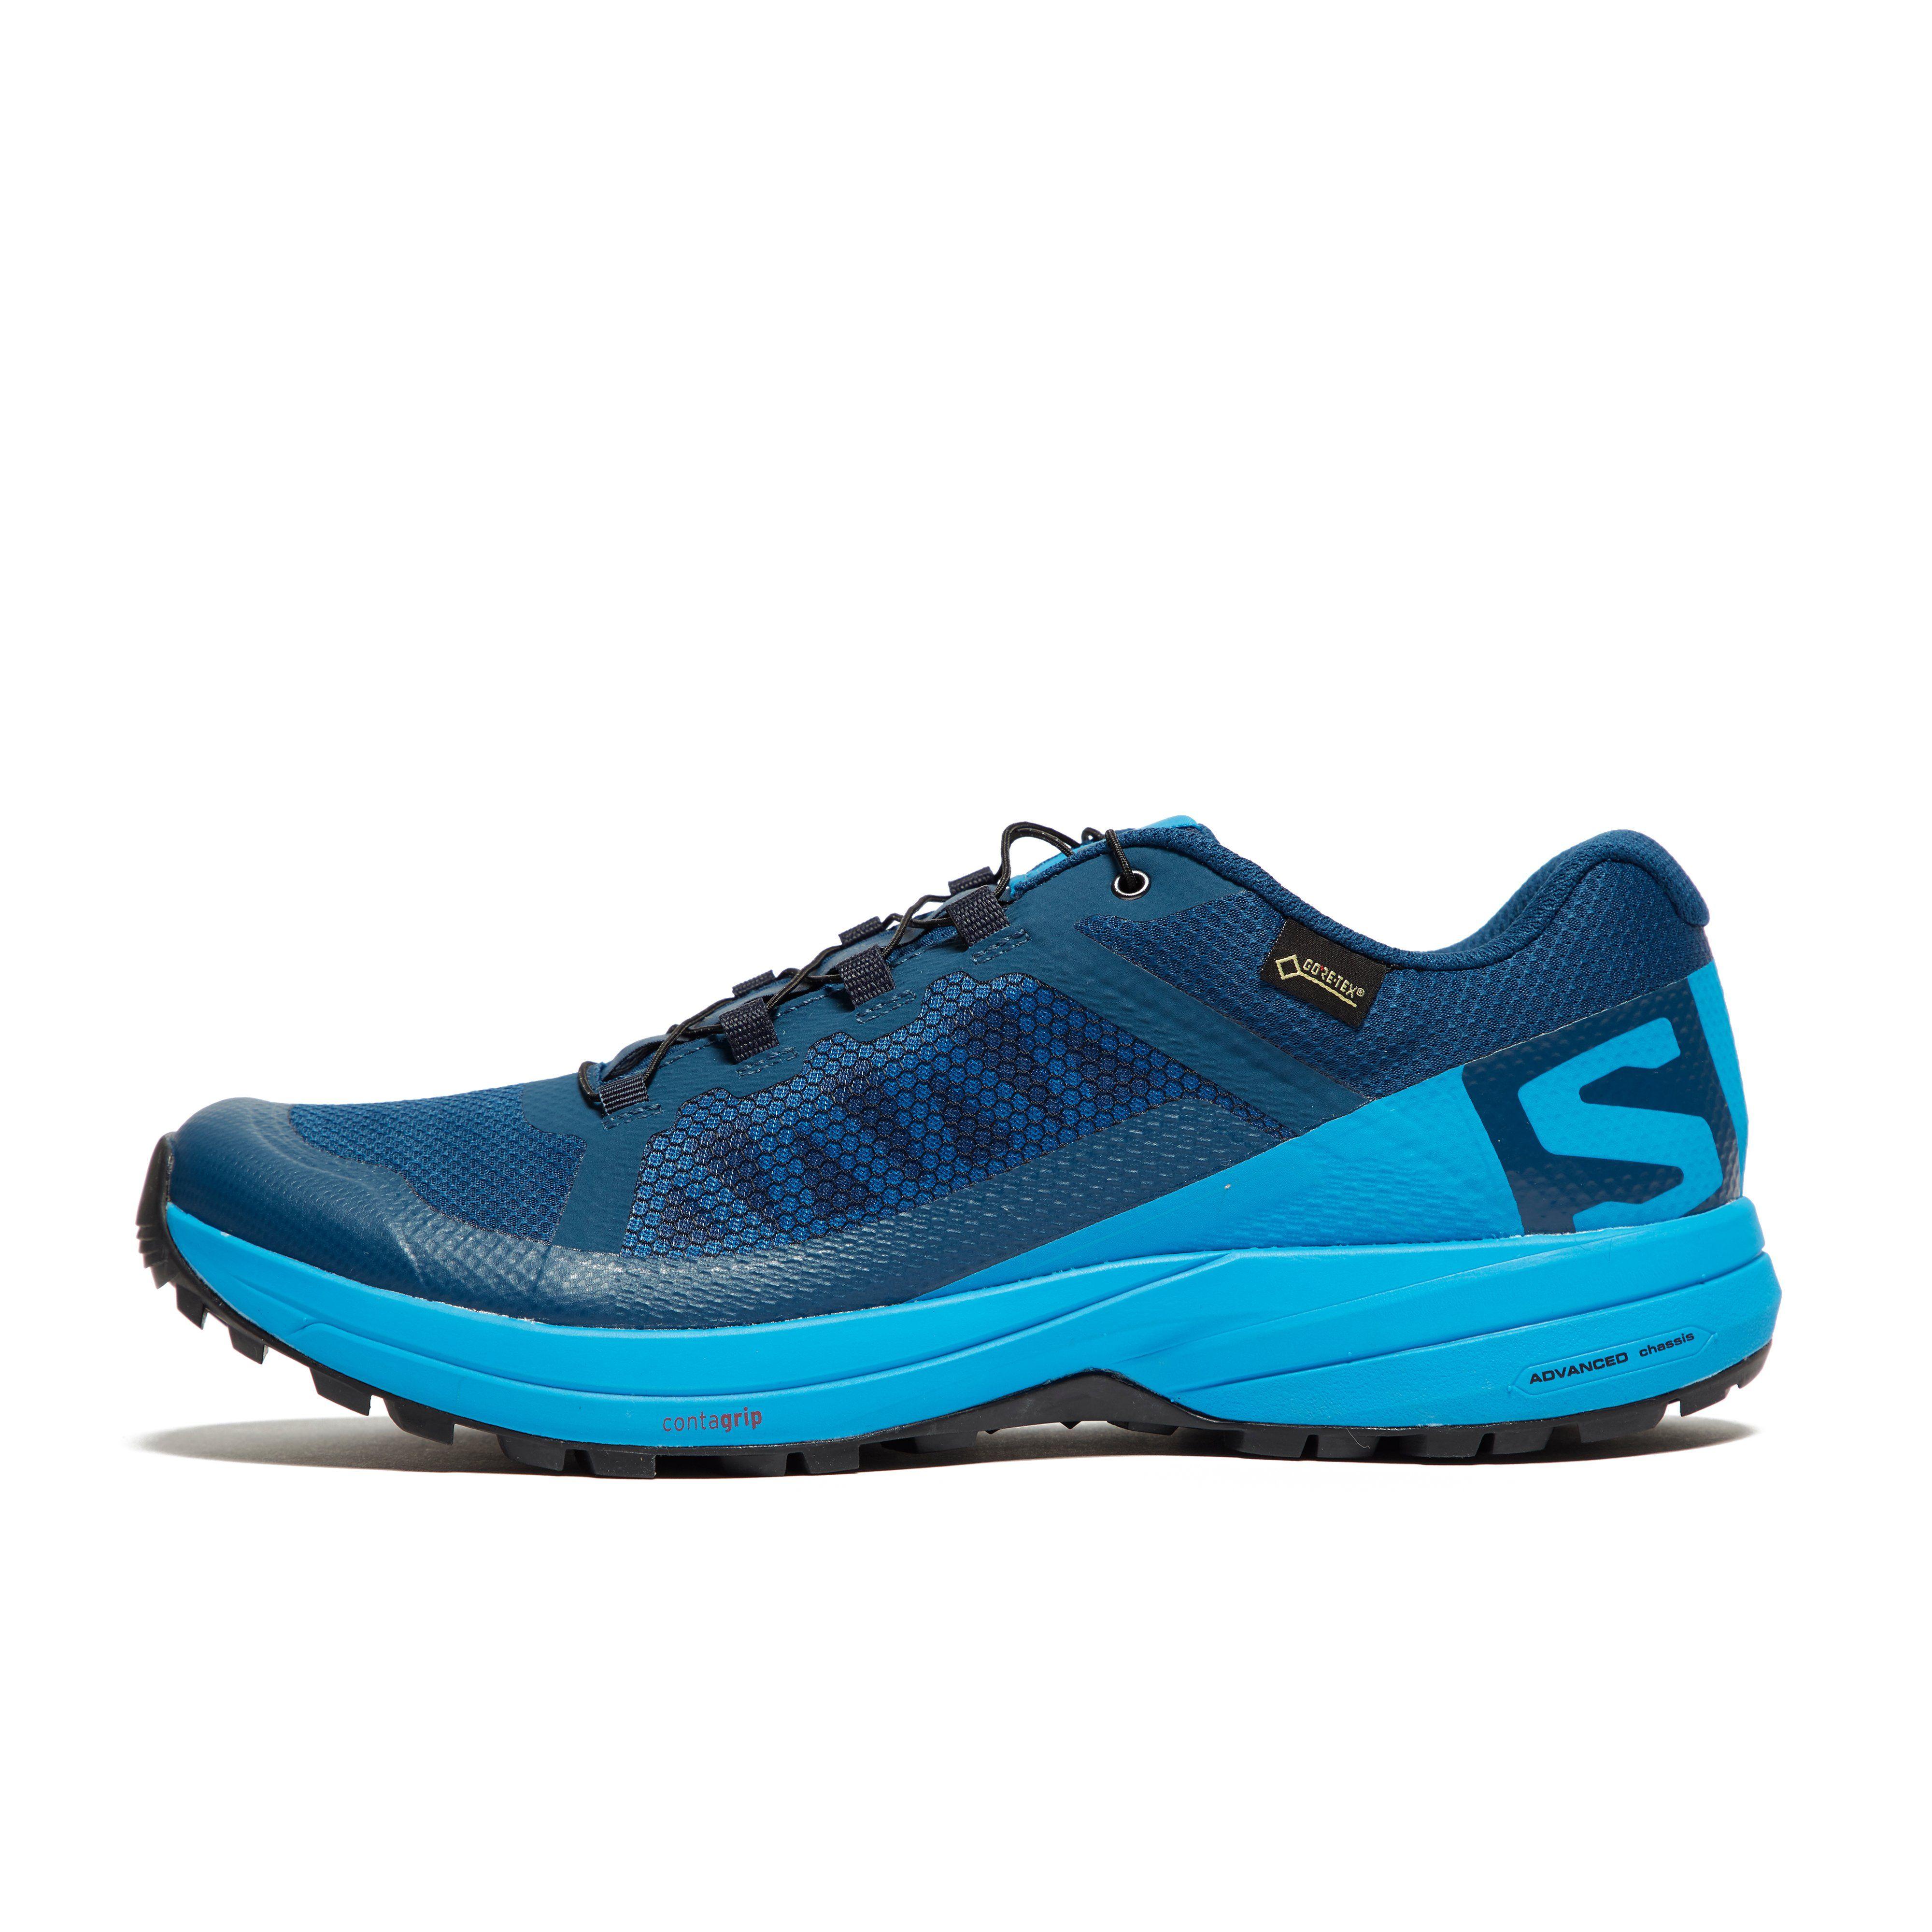 Salomon XA ELEVATE GTX Men's Trail Running Shoes